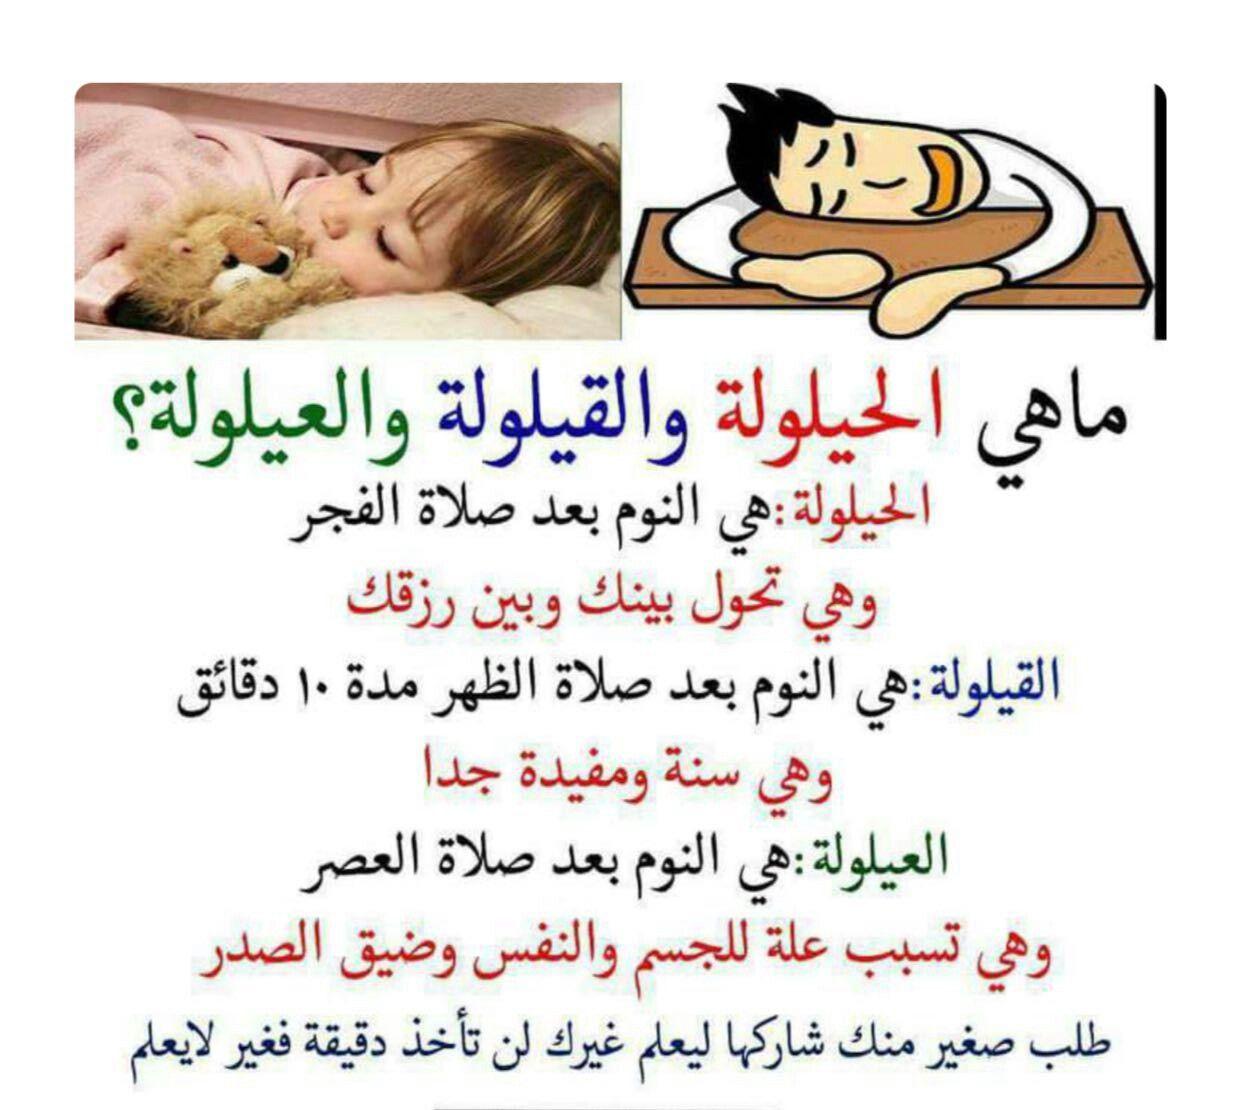 Pin By الامل بالله On الامل بالله Fitness Motivation Body Motivational Quotes Islamic Teachings